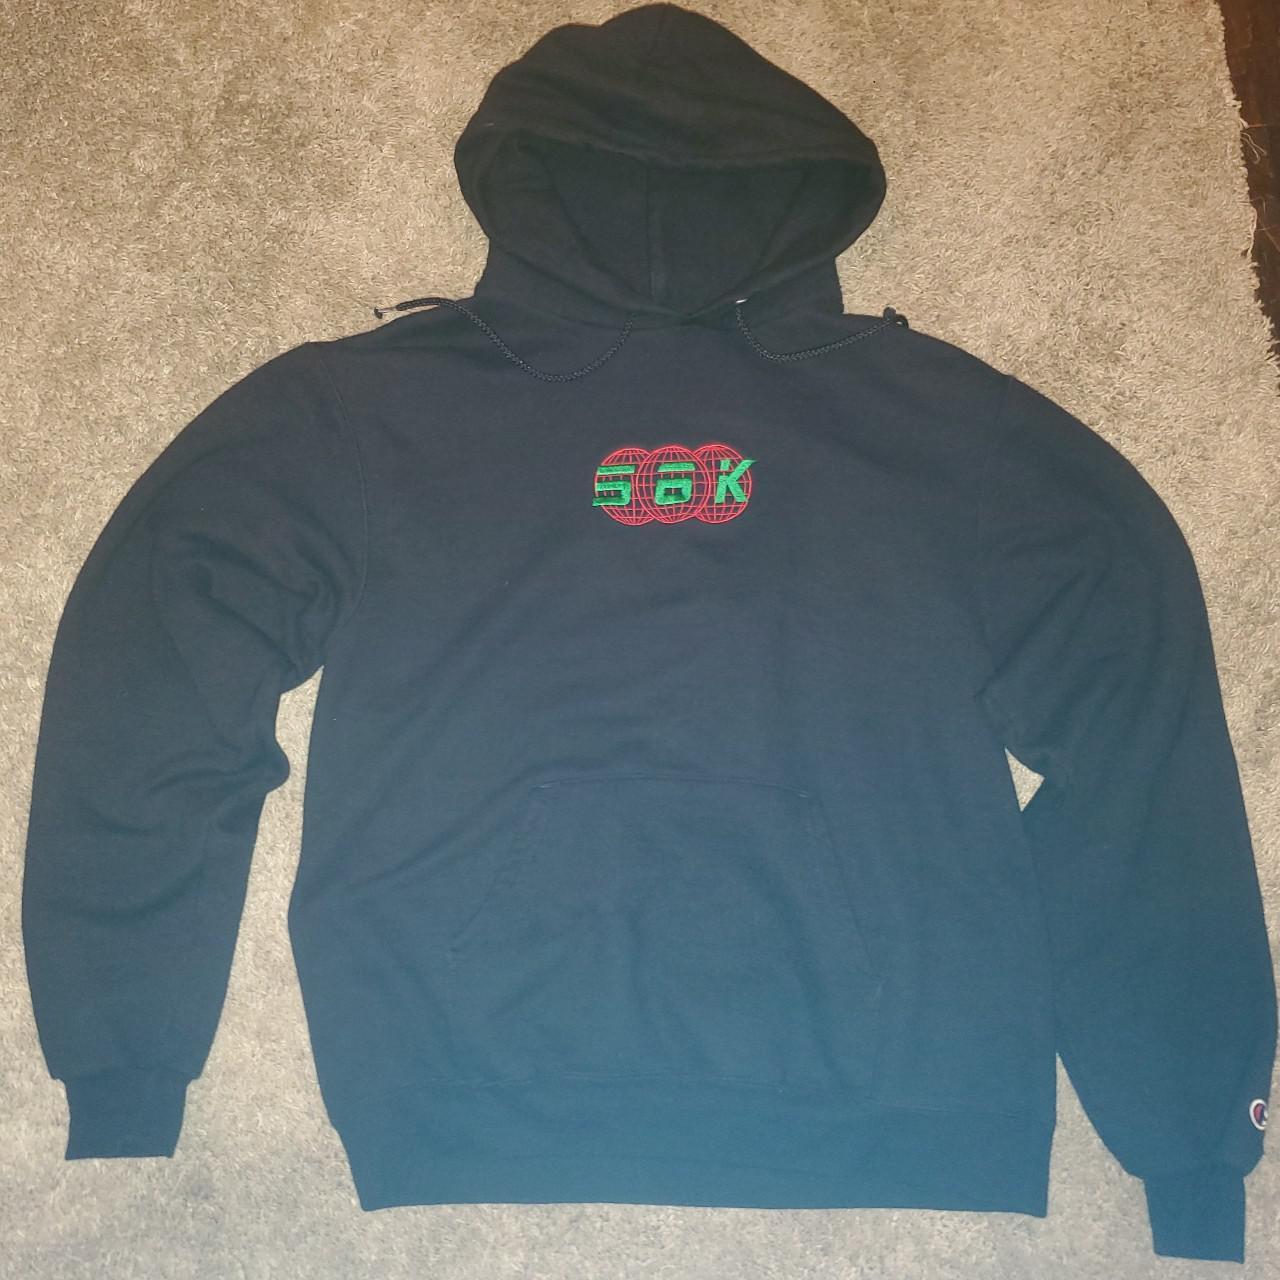 Product Image 1 - Bronze 56k hoodie Black 9/10 Medium   #bronze56k #bronze #bronze56khoodie